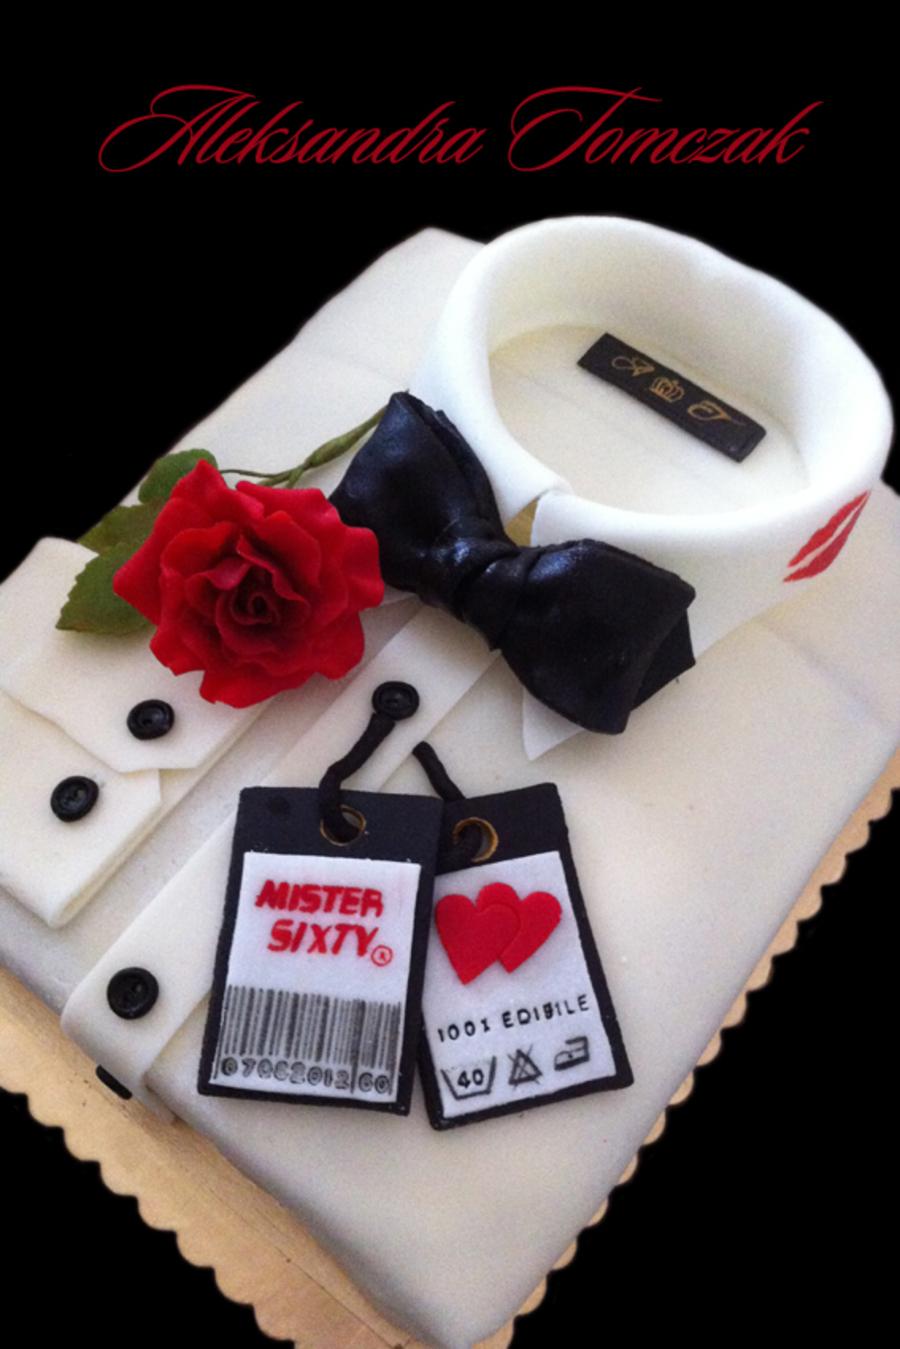 James bond shirt cake number 3 for T shirt cake decoration